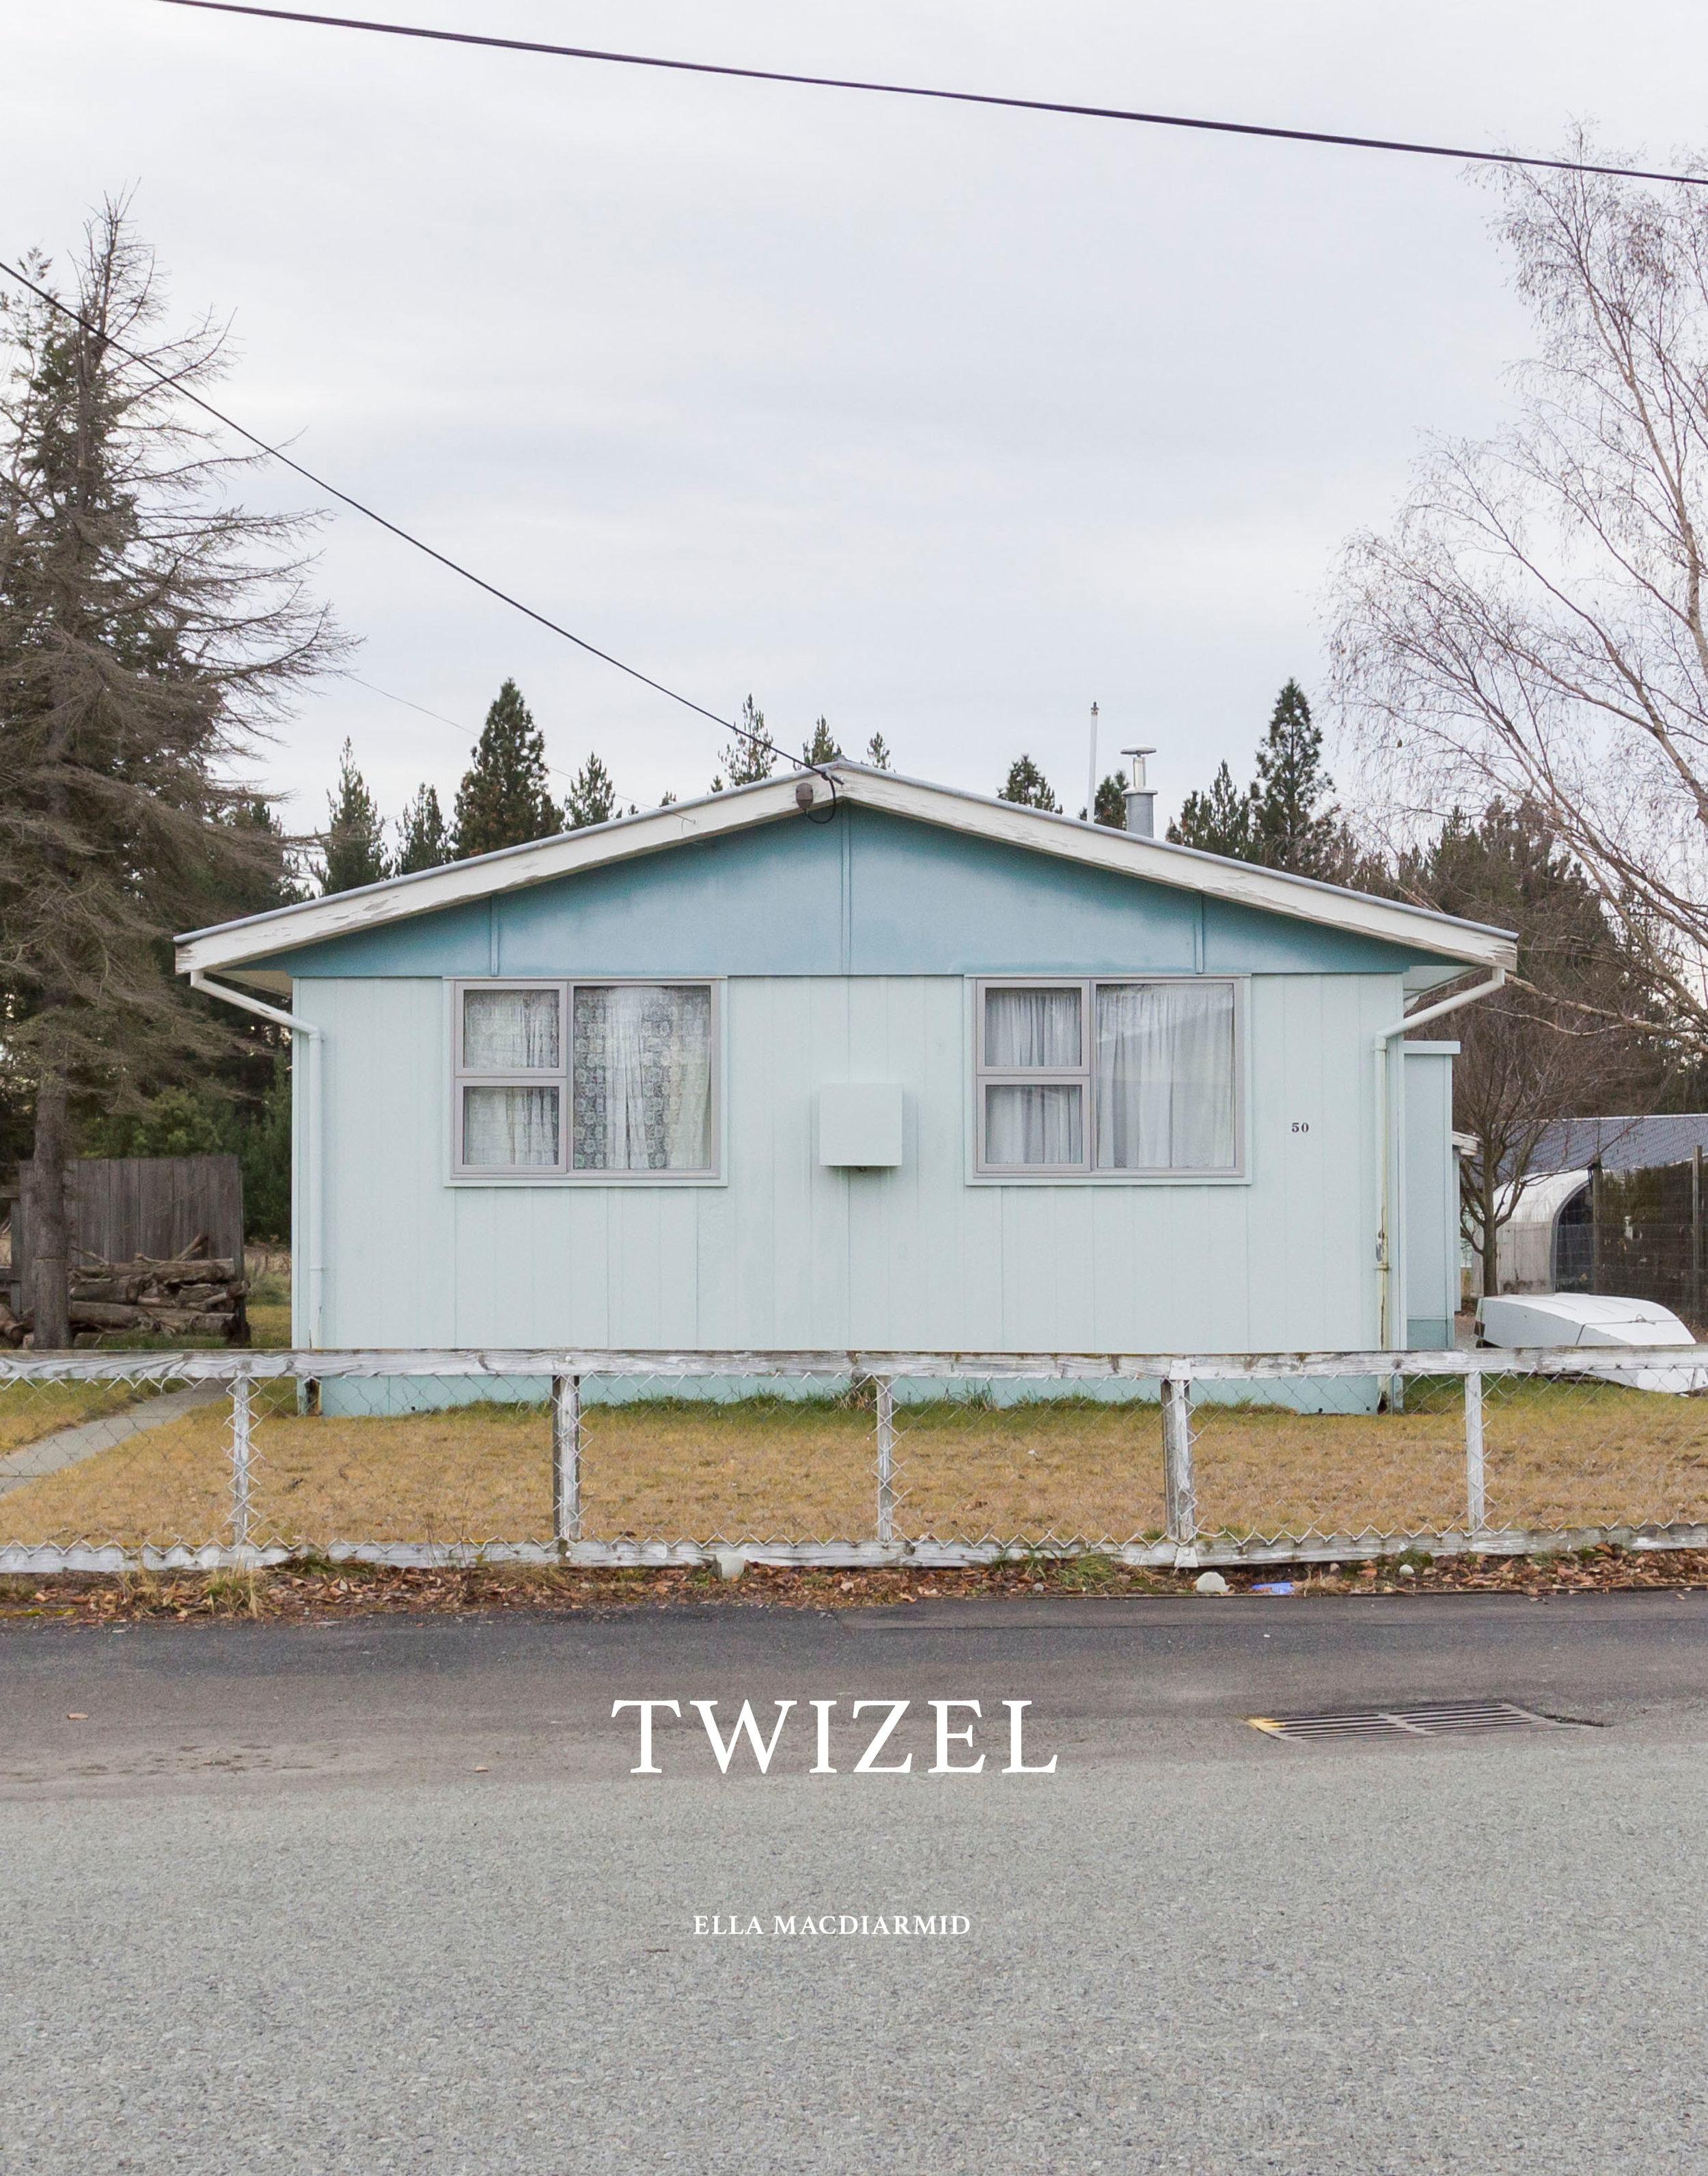 002 Twizel Covers_book_singlepages.jpg